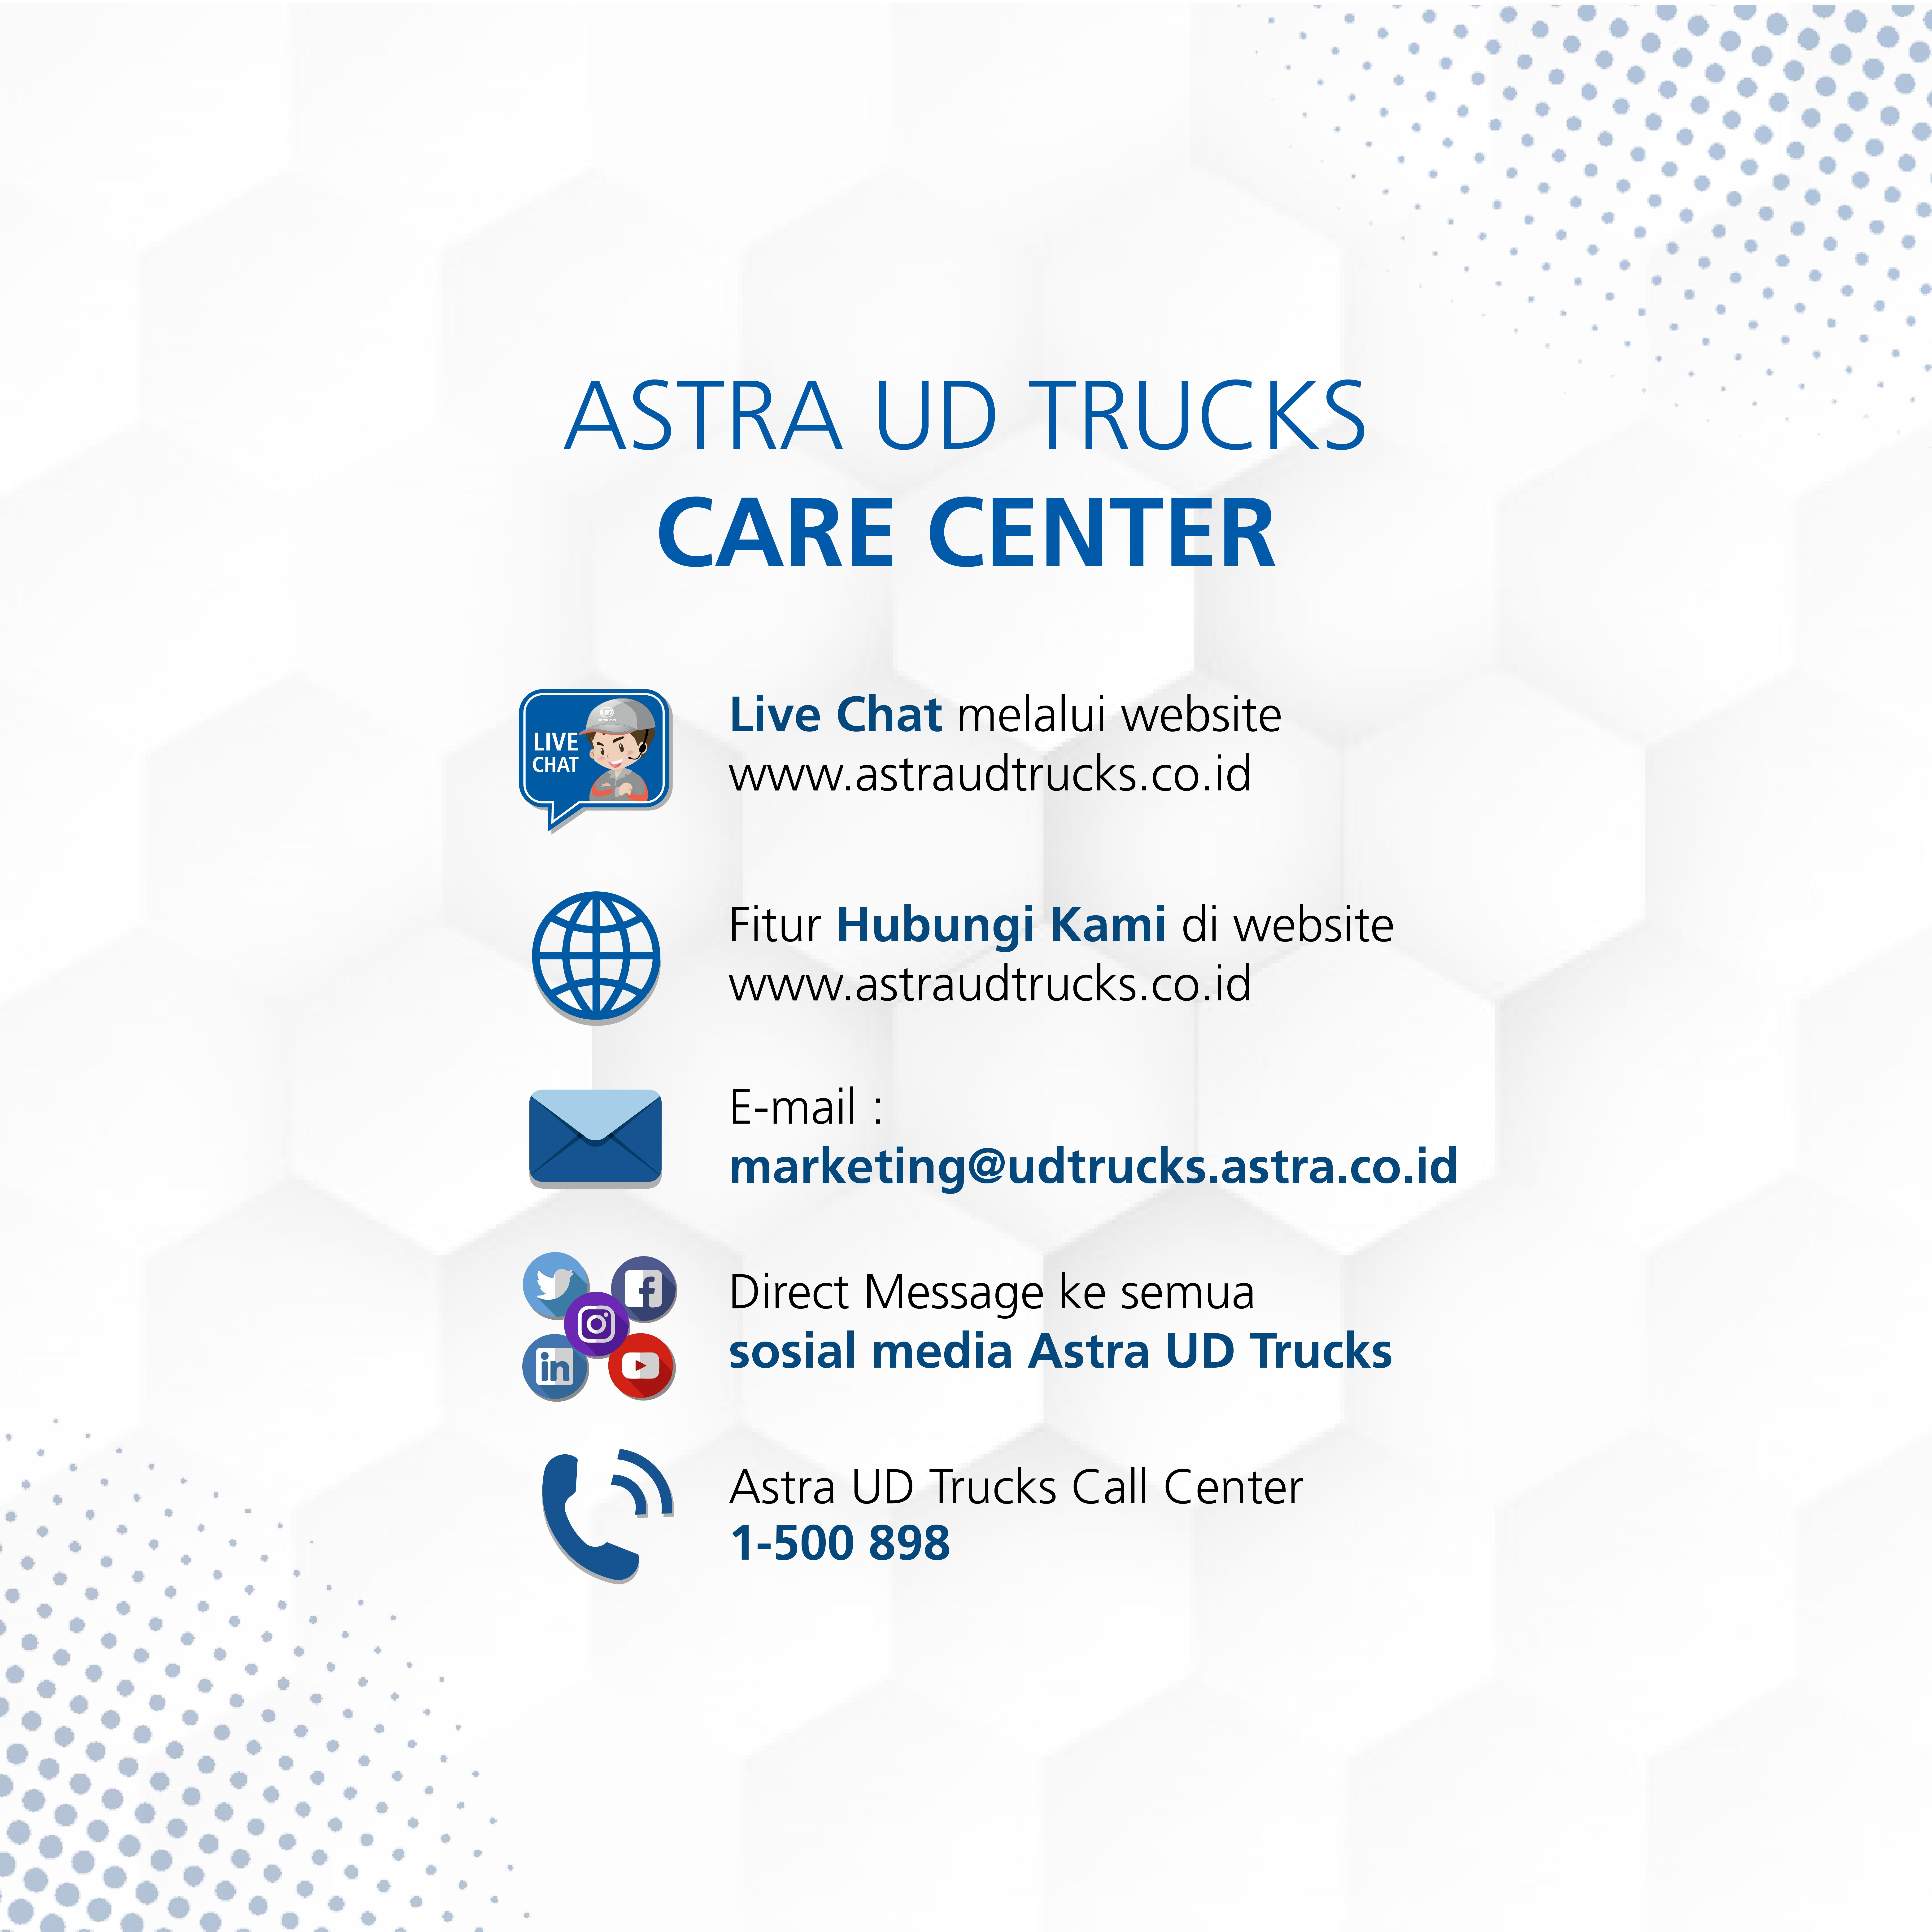 Astra UD Trucks Care Center